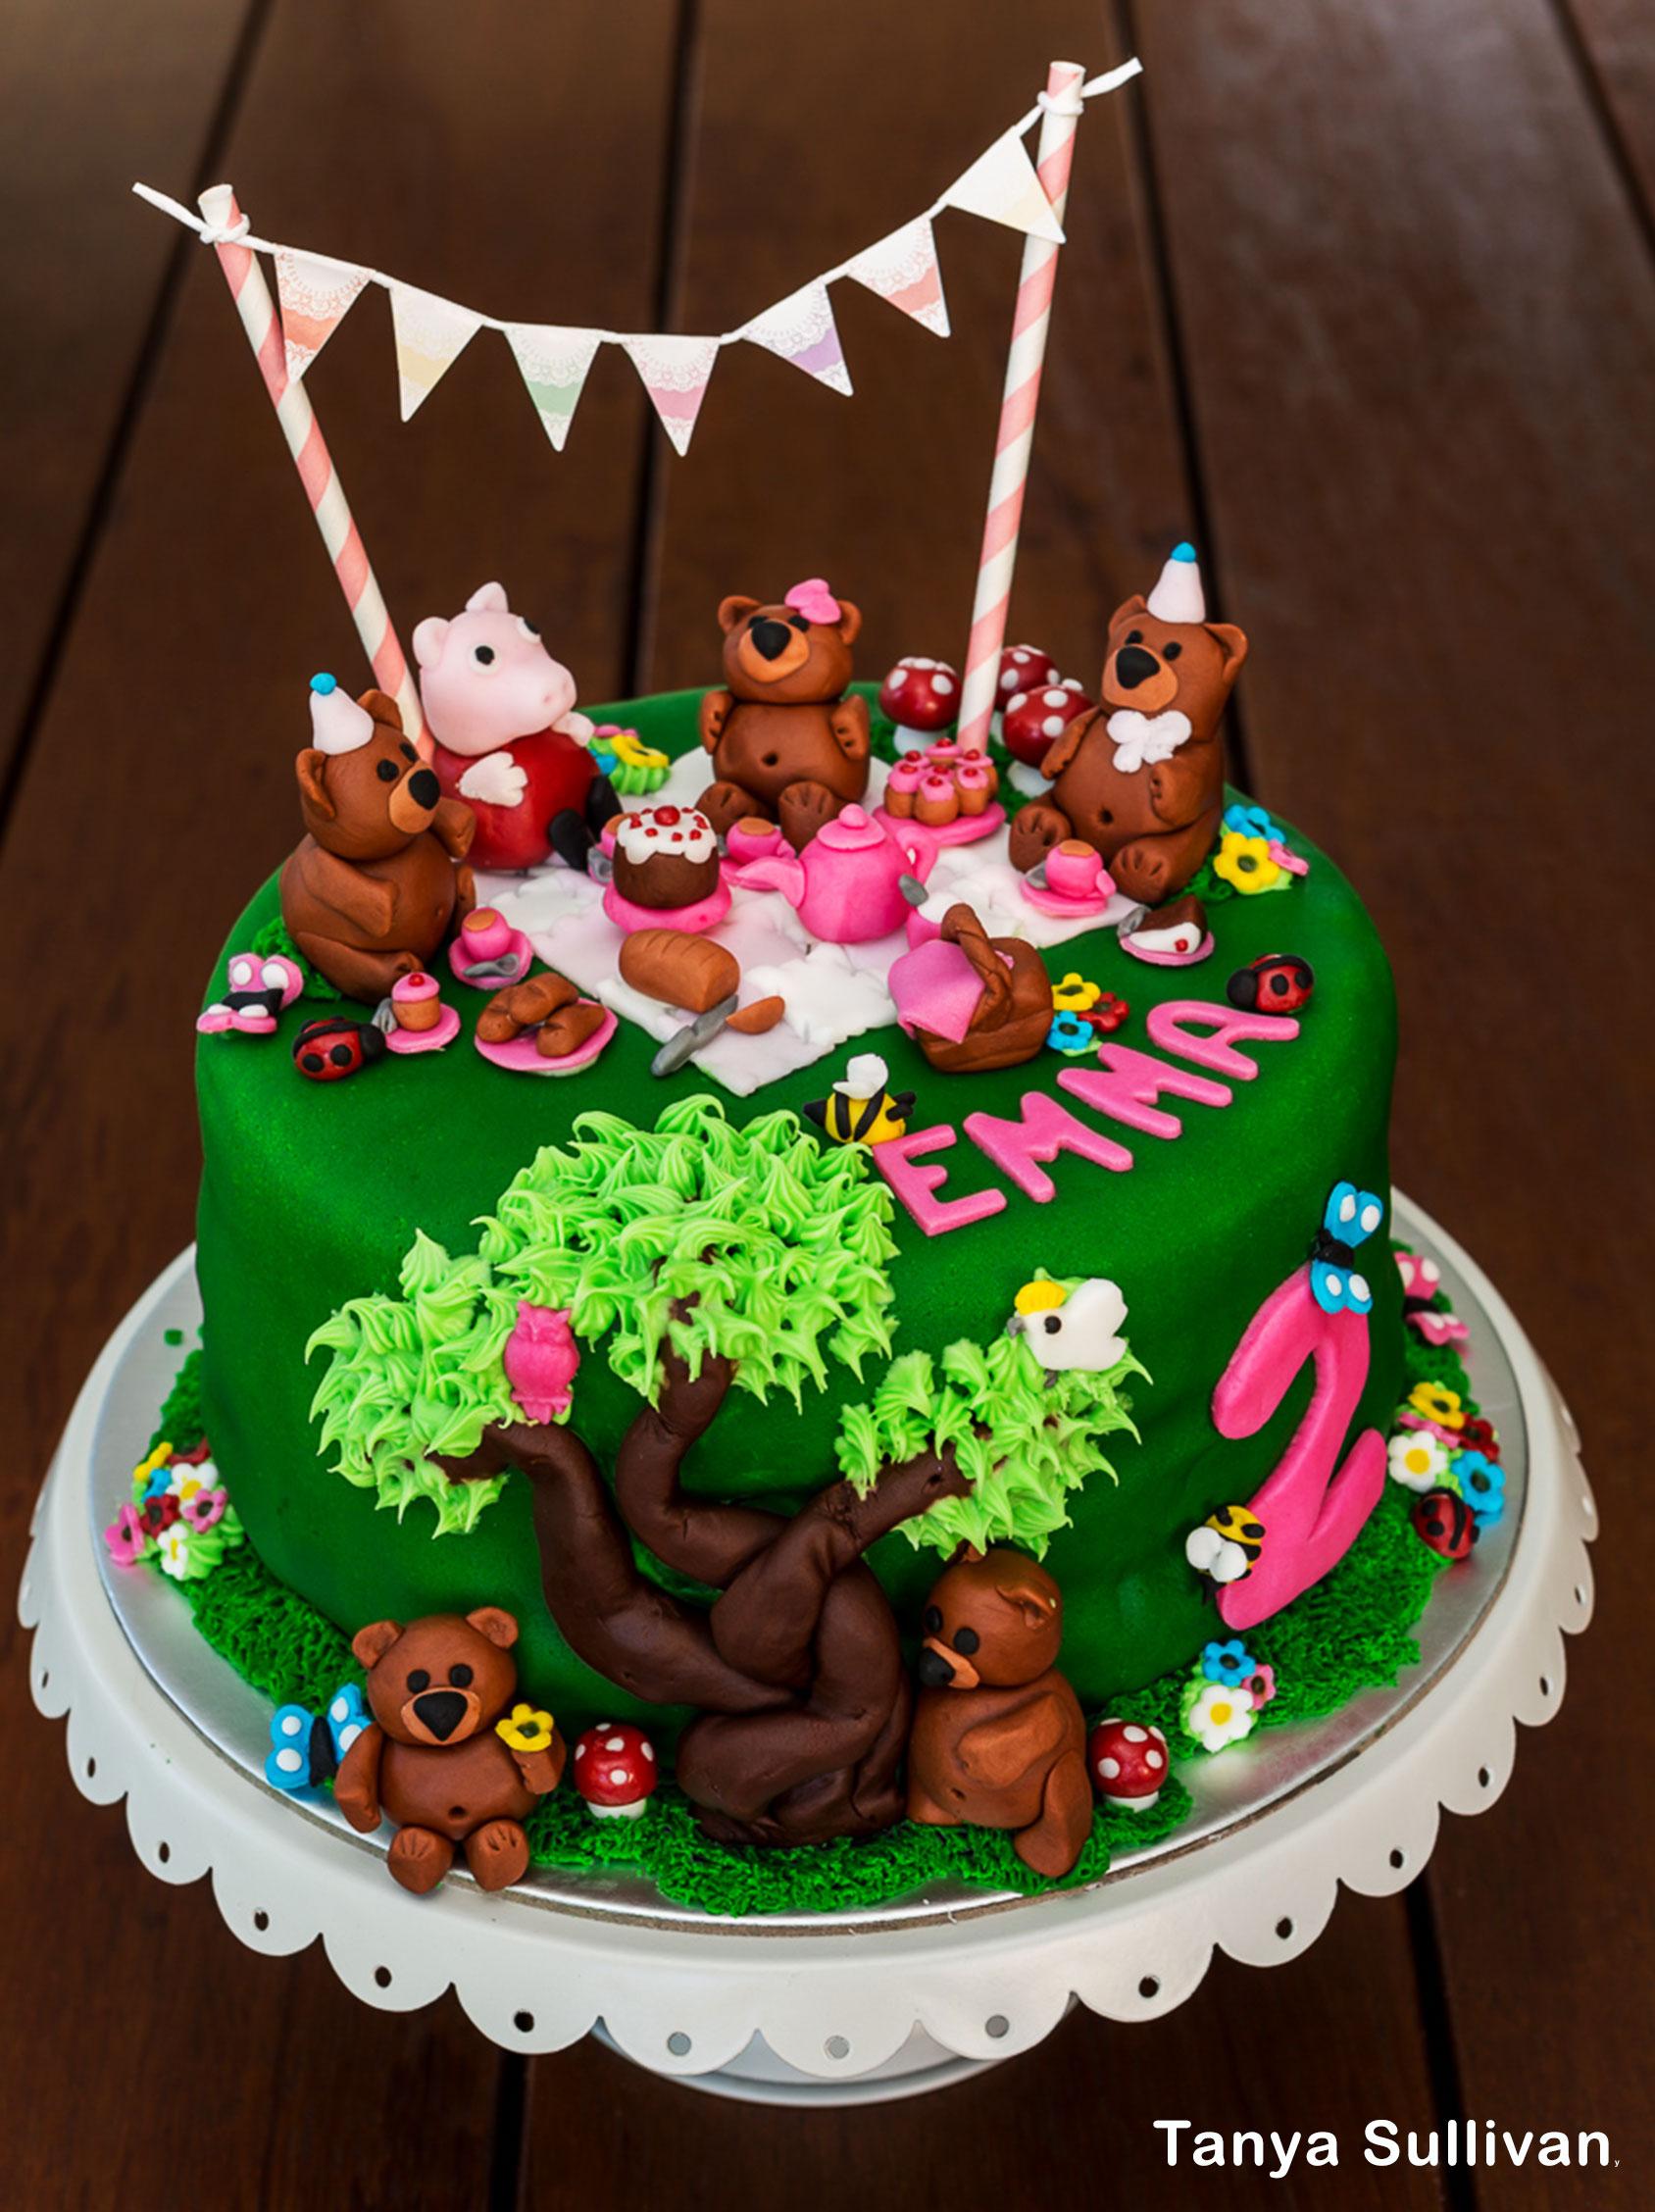 Babyology Followers Share Their Birthday Cake Masterpieces